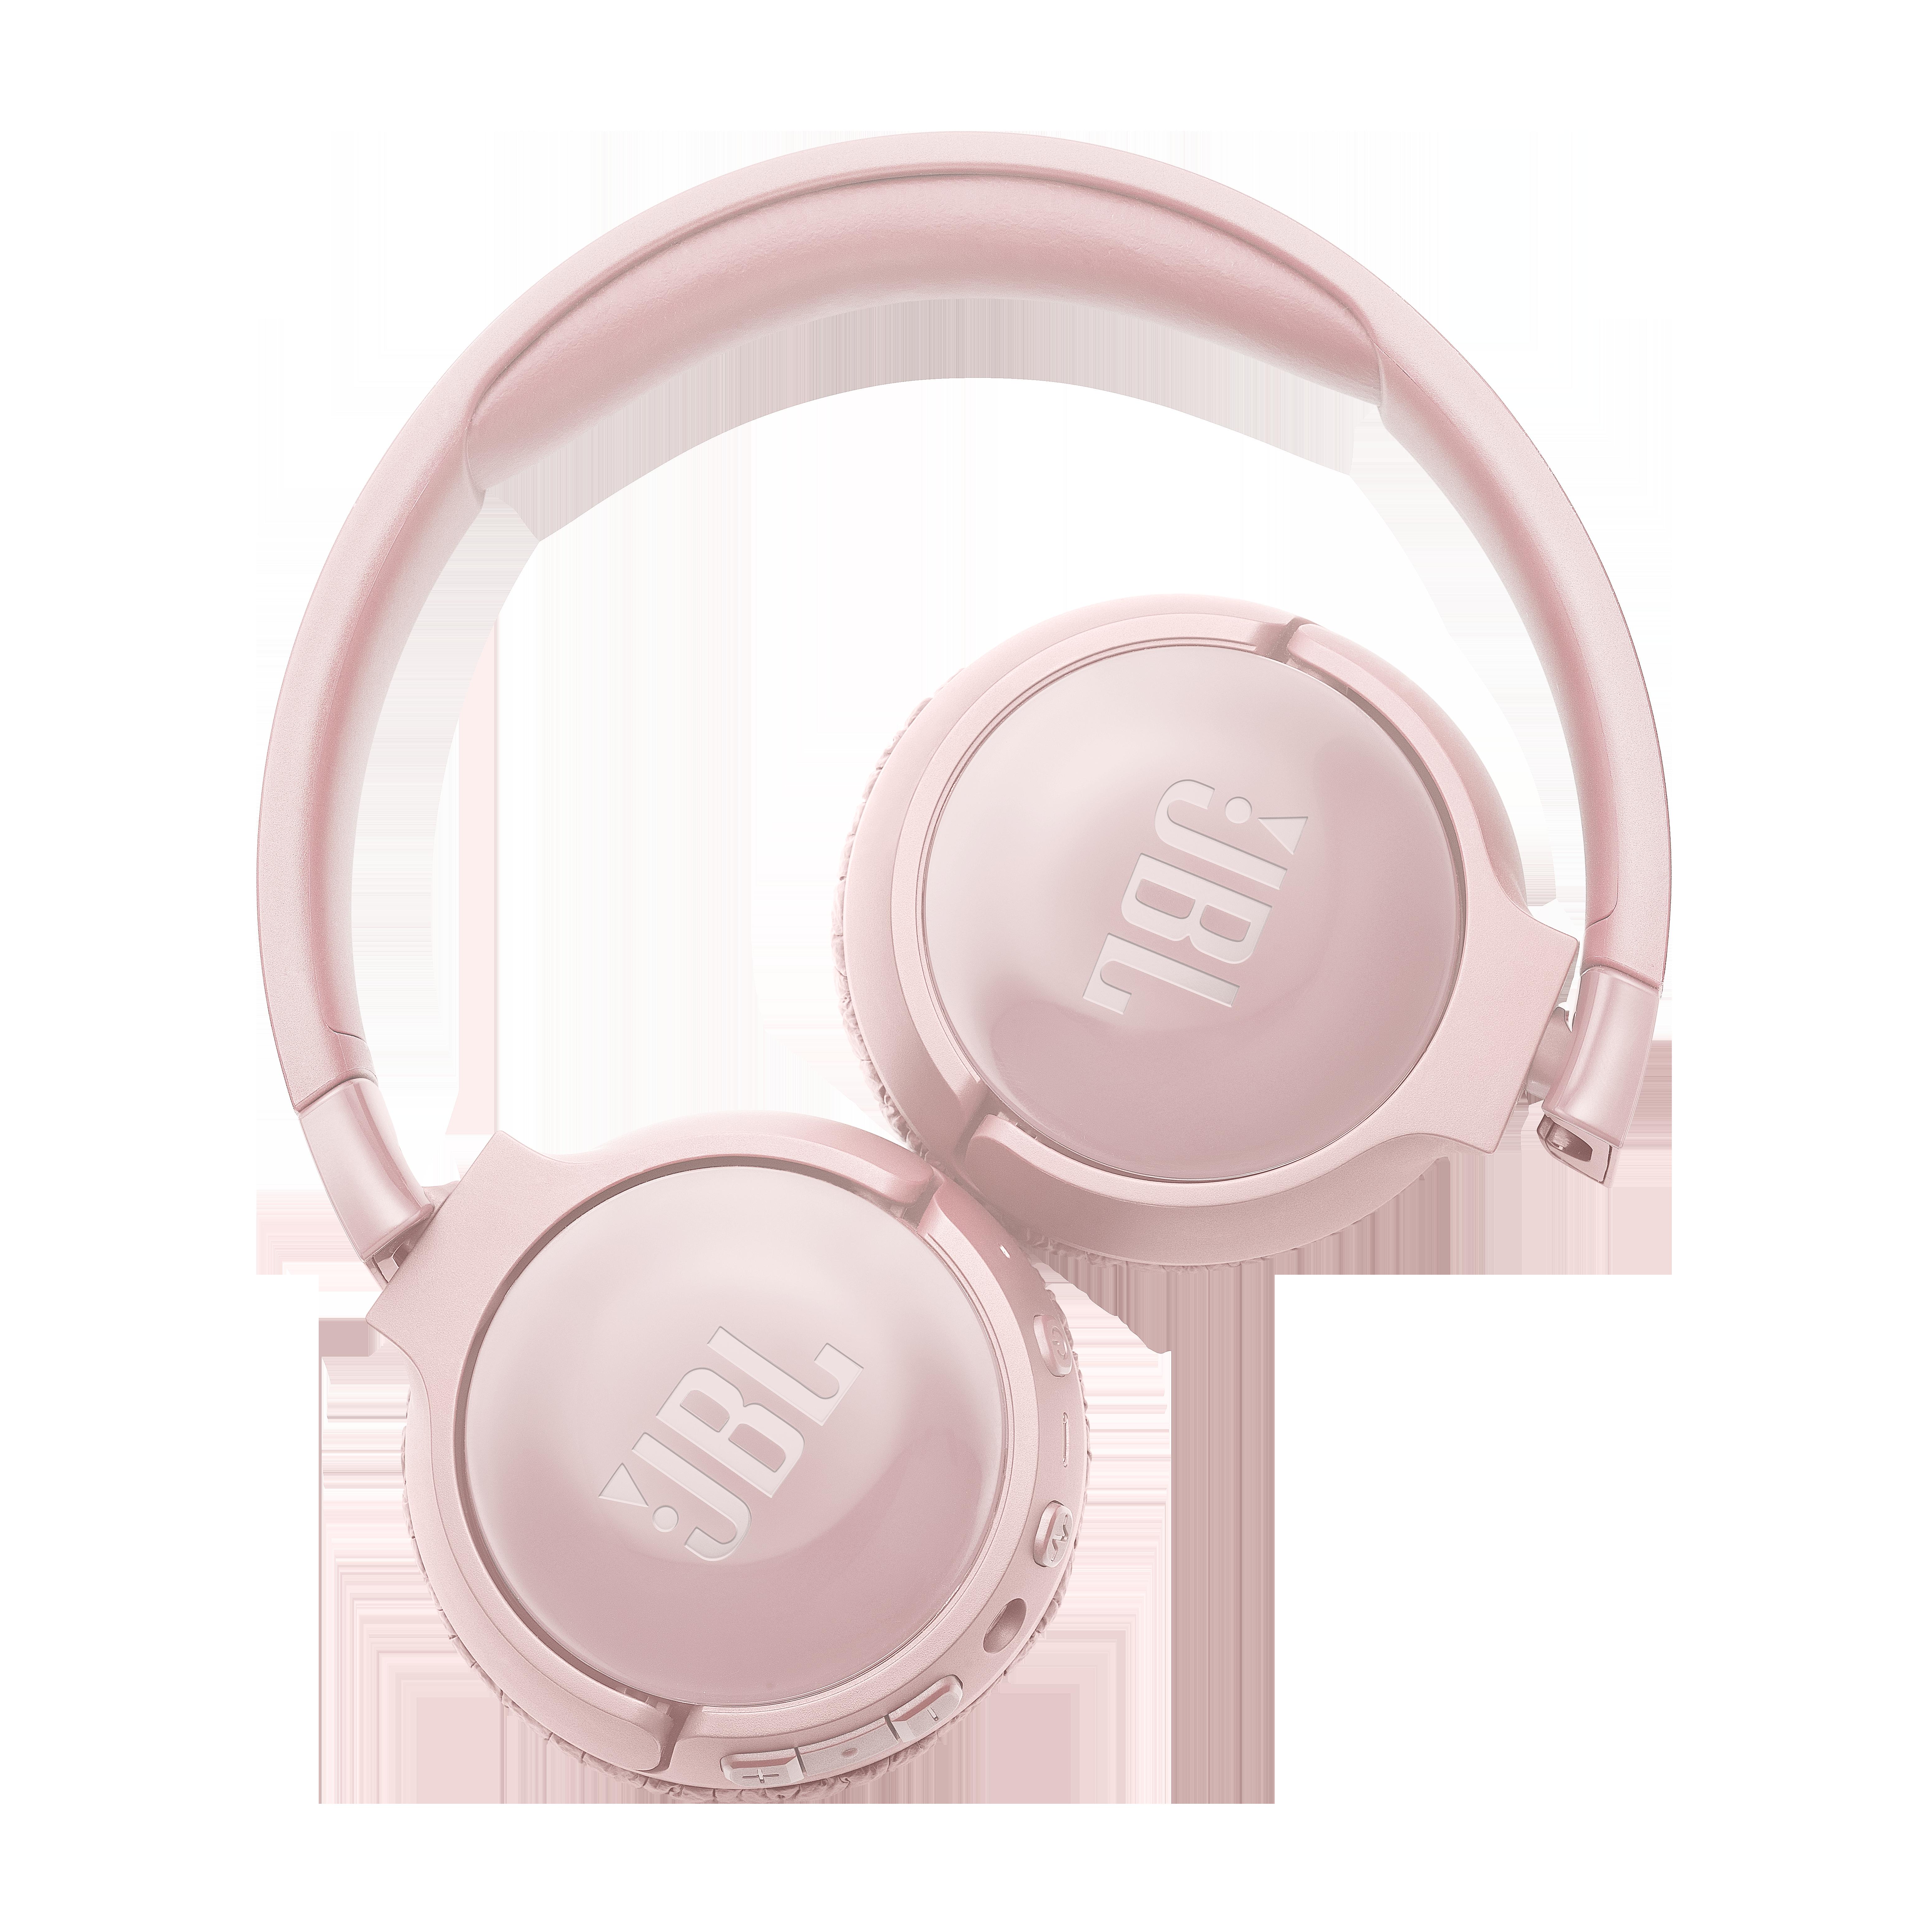 JBL TUNE 600BTNC - Pink - Wireless, on-ear, active noise-cancelling headphones. - Detailshot 4